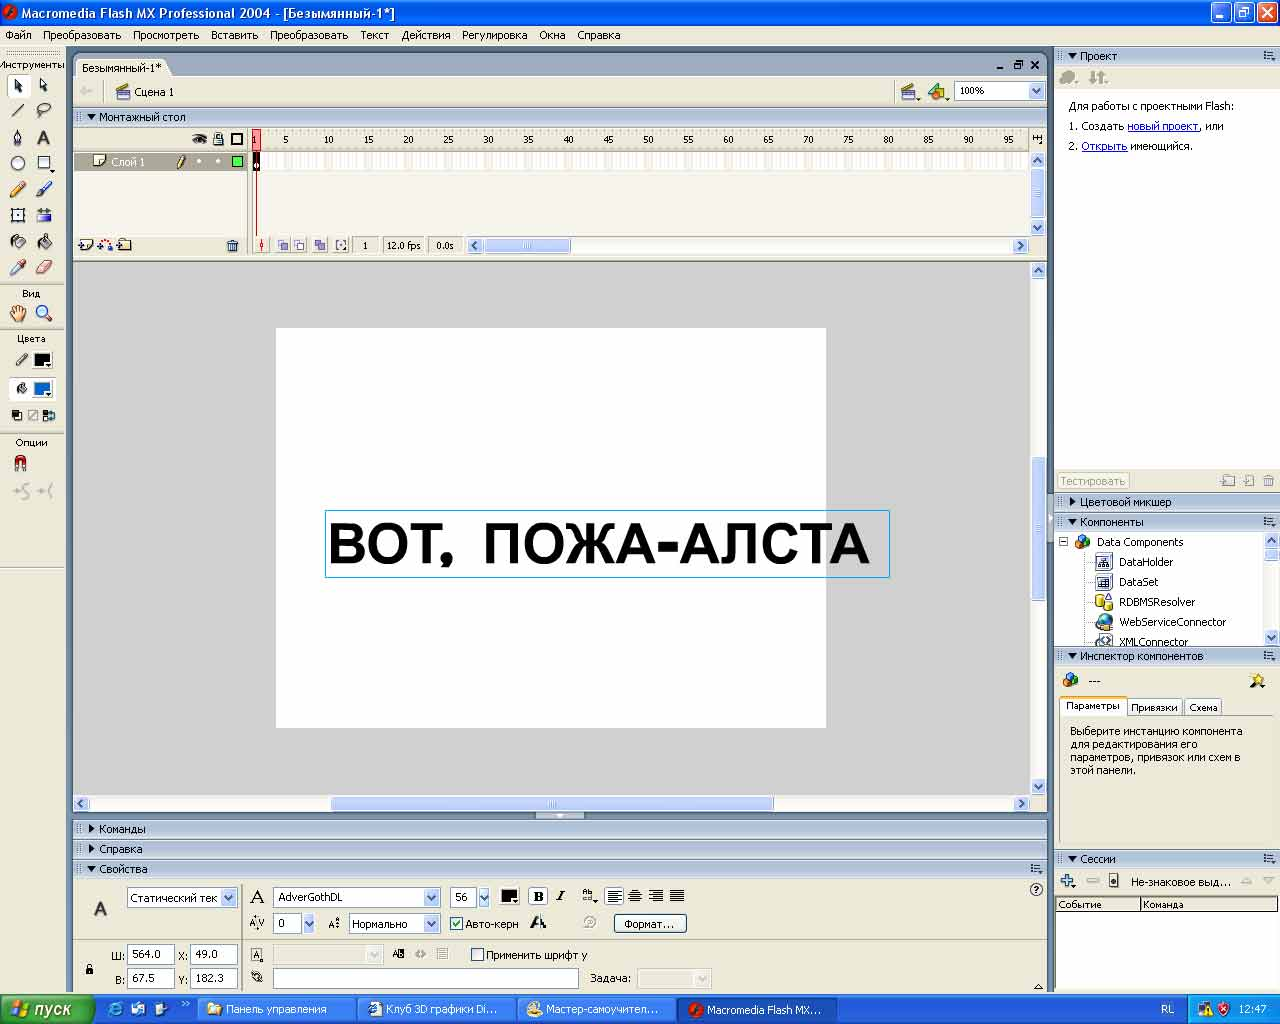 Ada beberapa menu di halaman awal macromedia flash mx professional 2004, yaitu